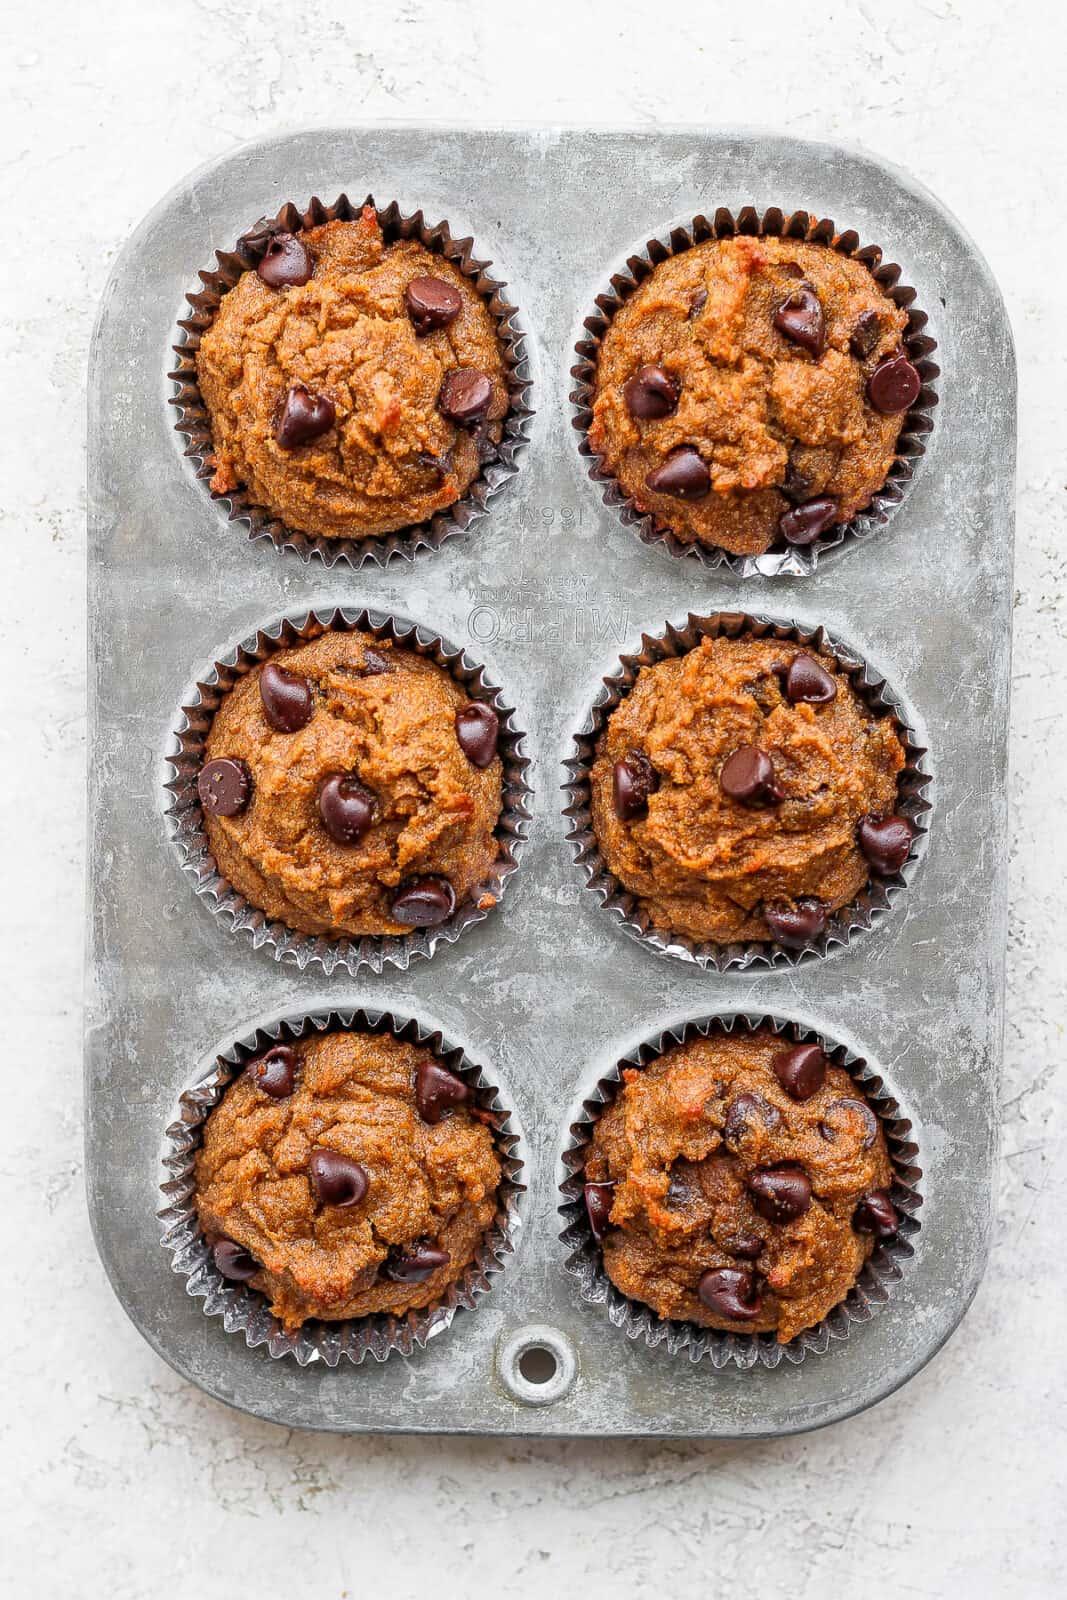 Pumpkin muffins in a muffin tin after baking.